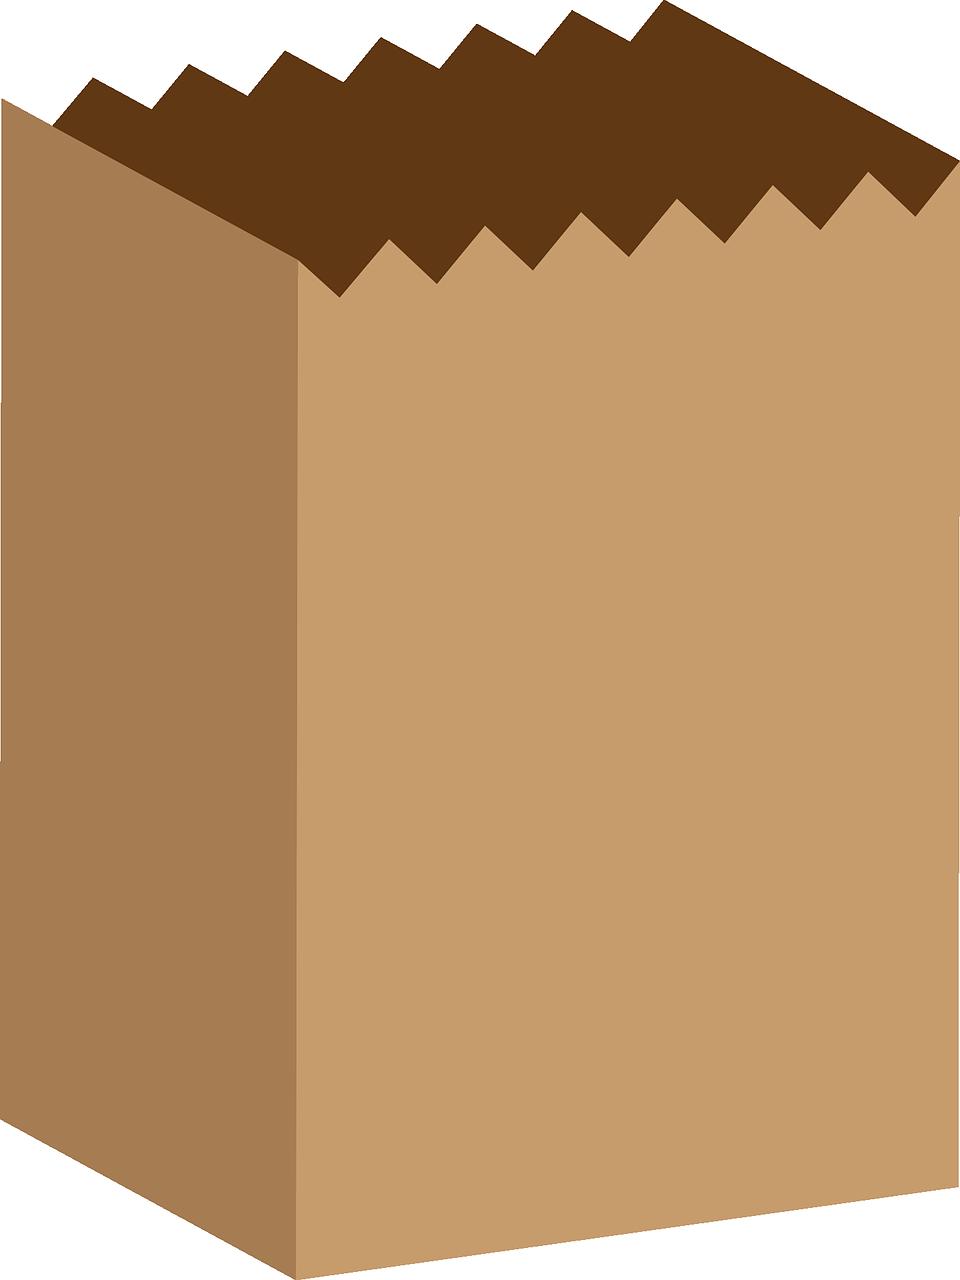 bag-161440_1280.png